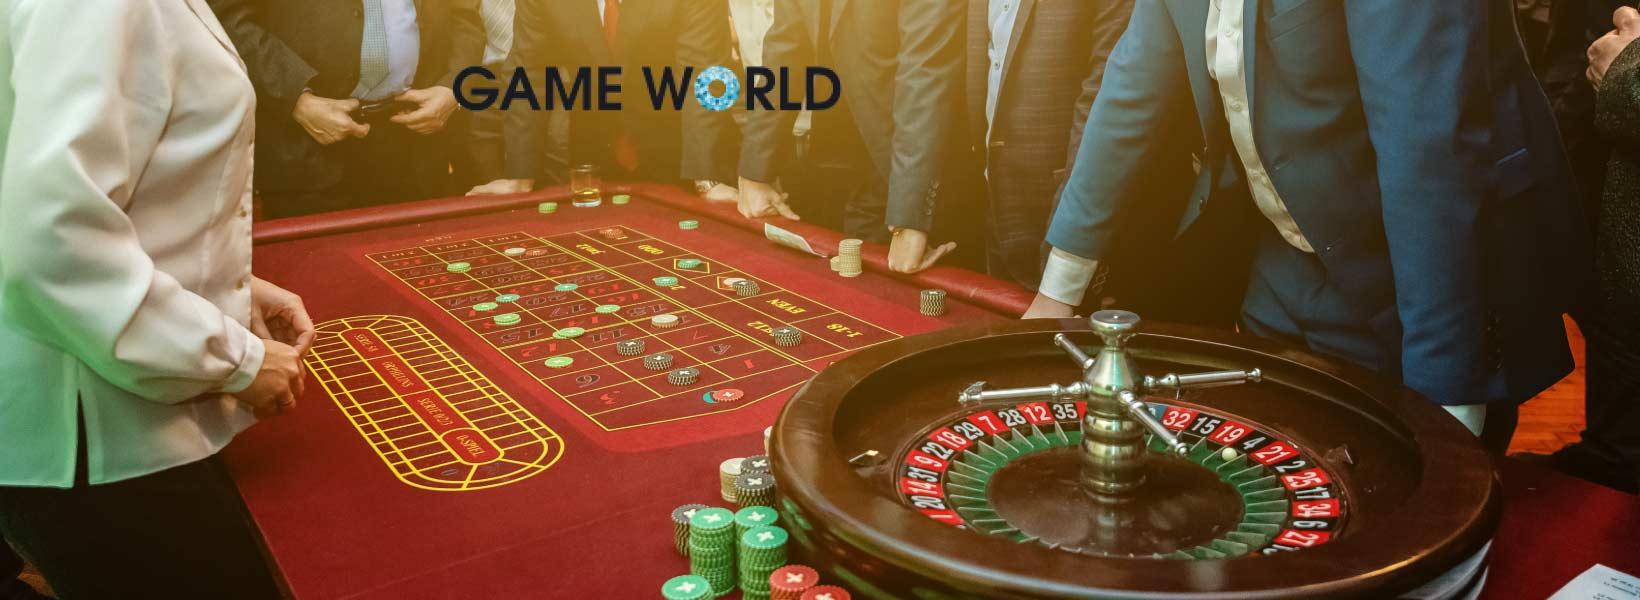 game world live casino